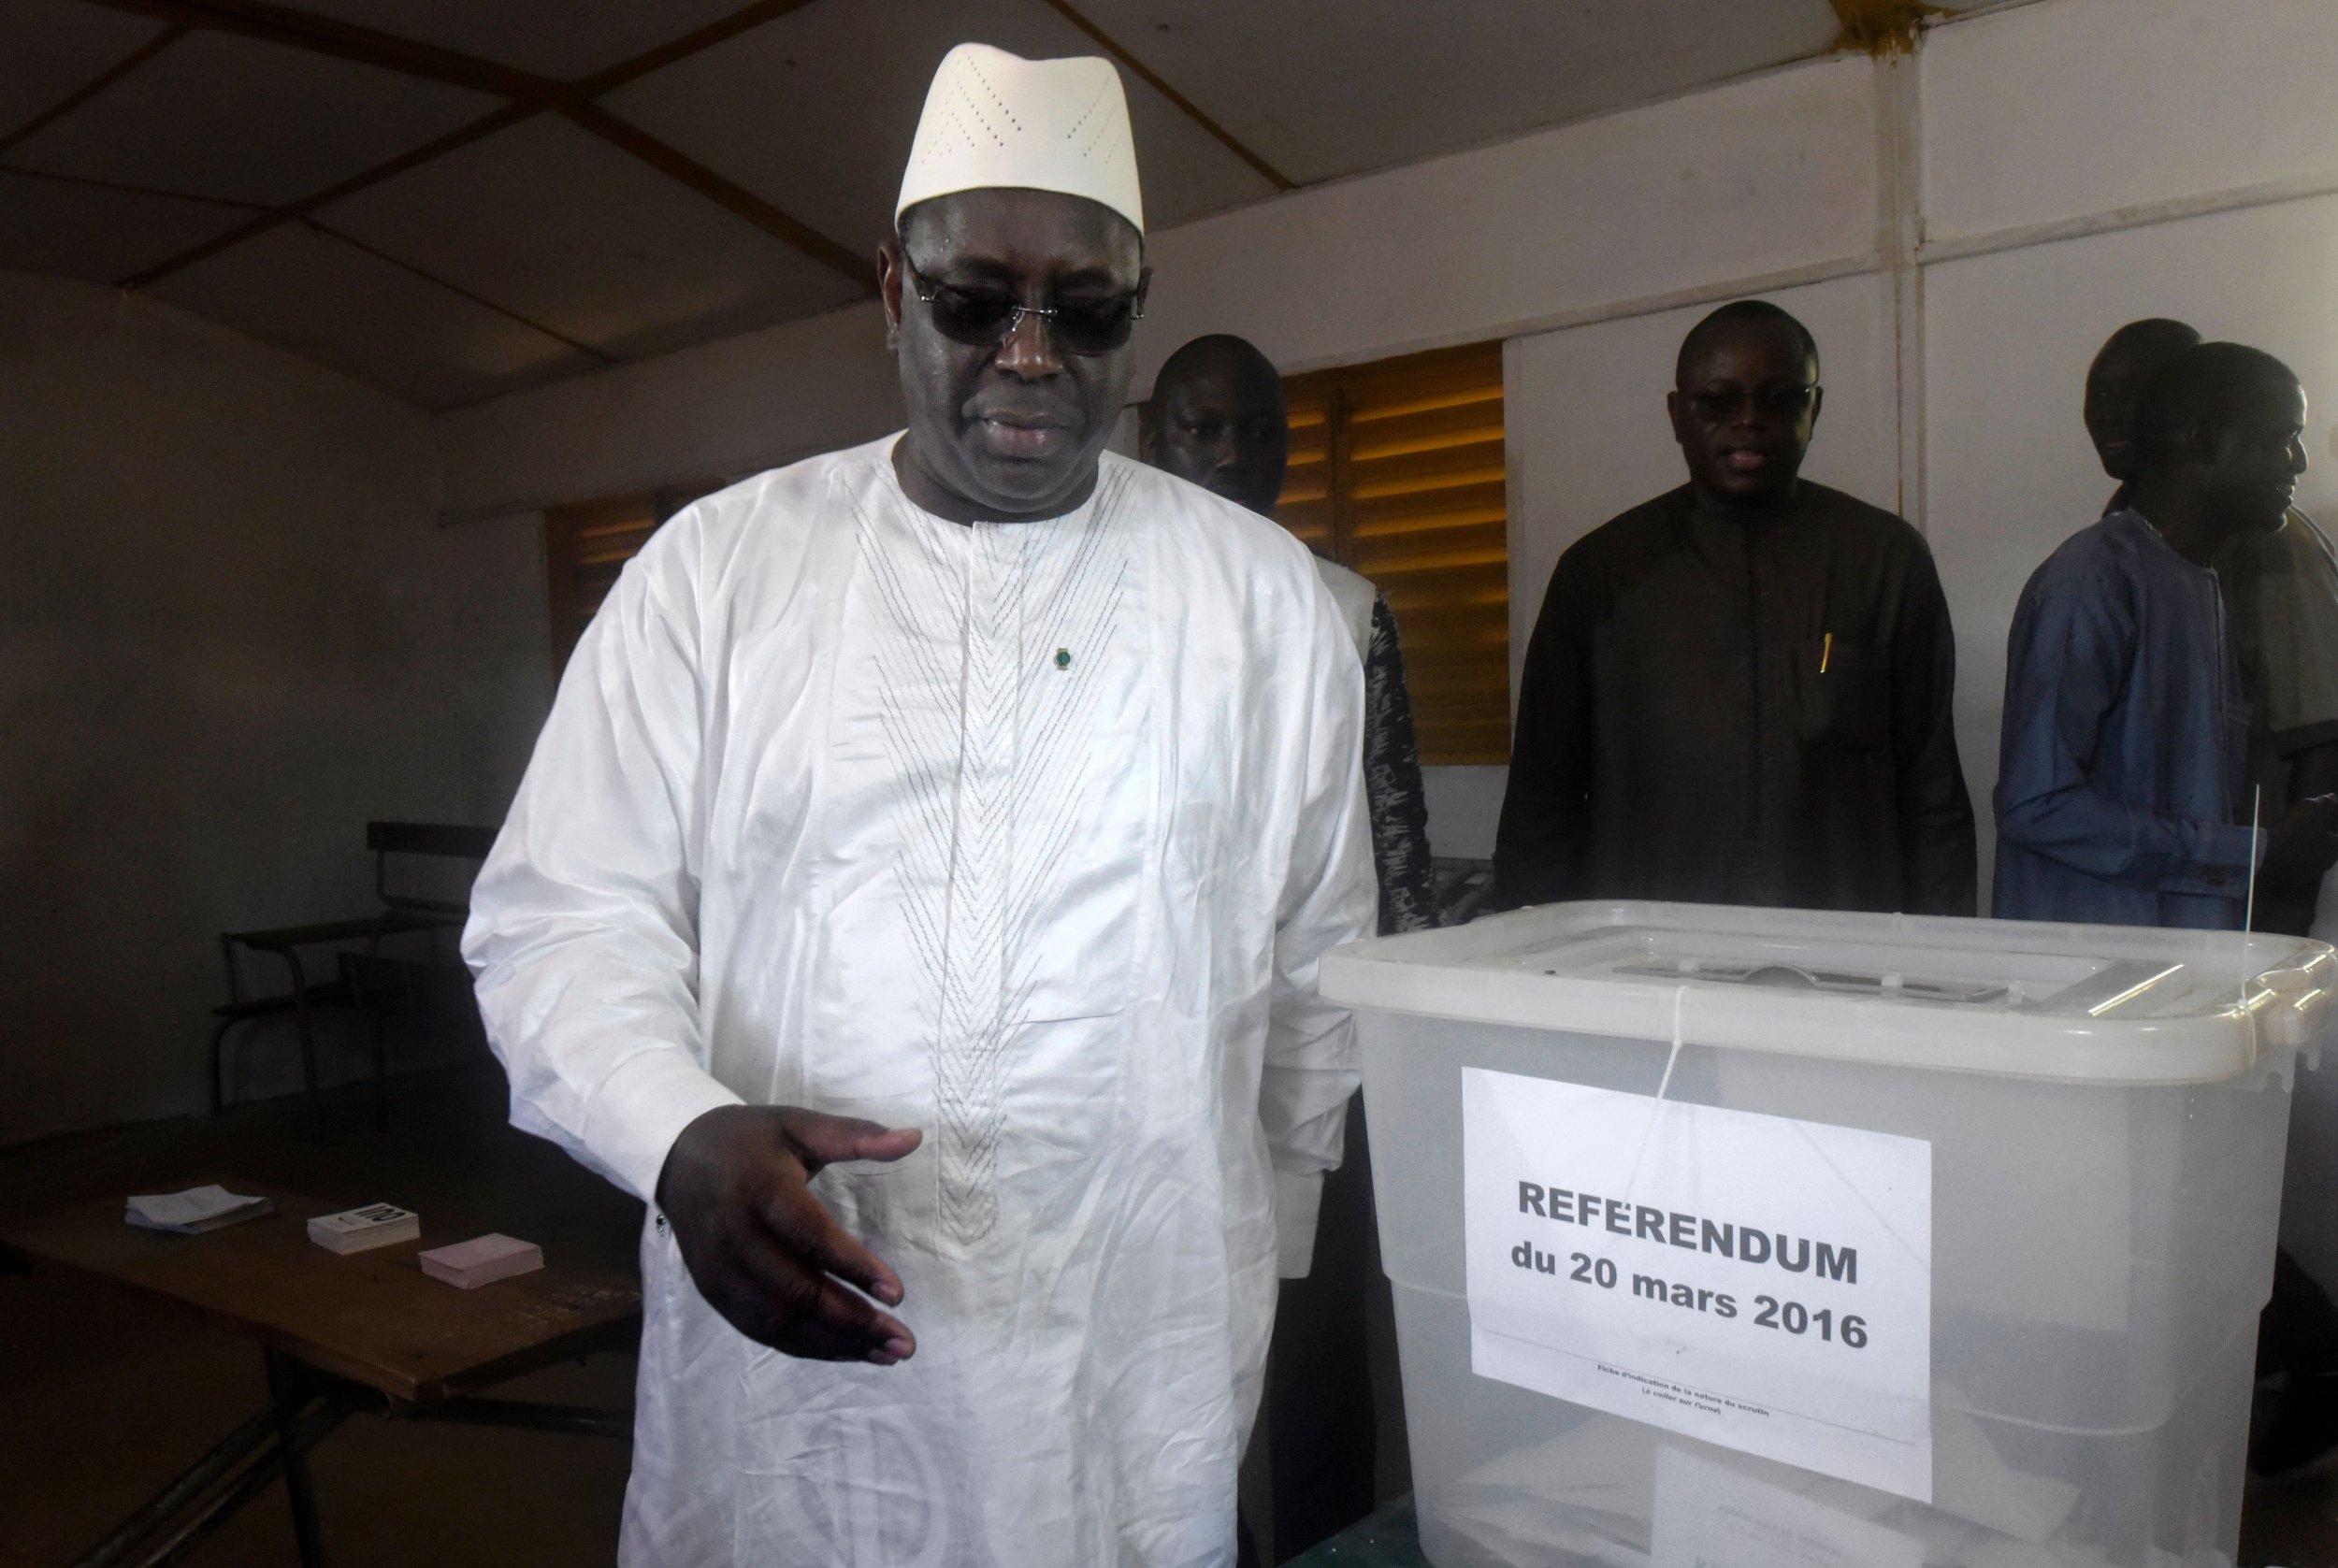 Senegalese President Macky Sall votes in the referendum.